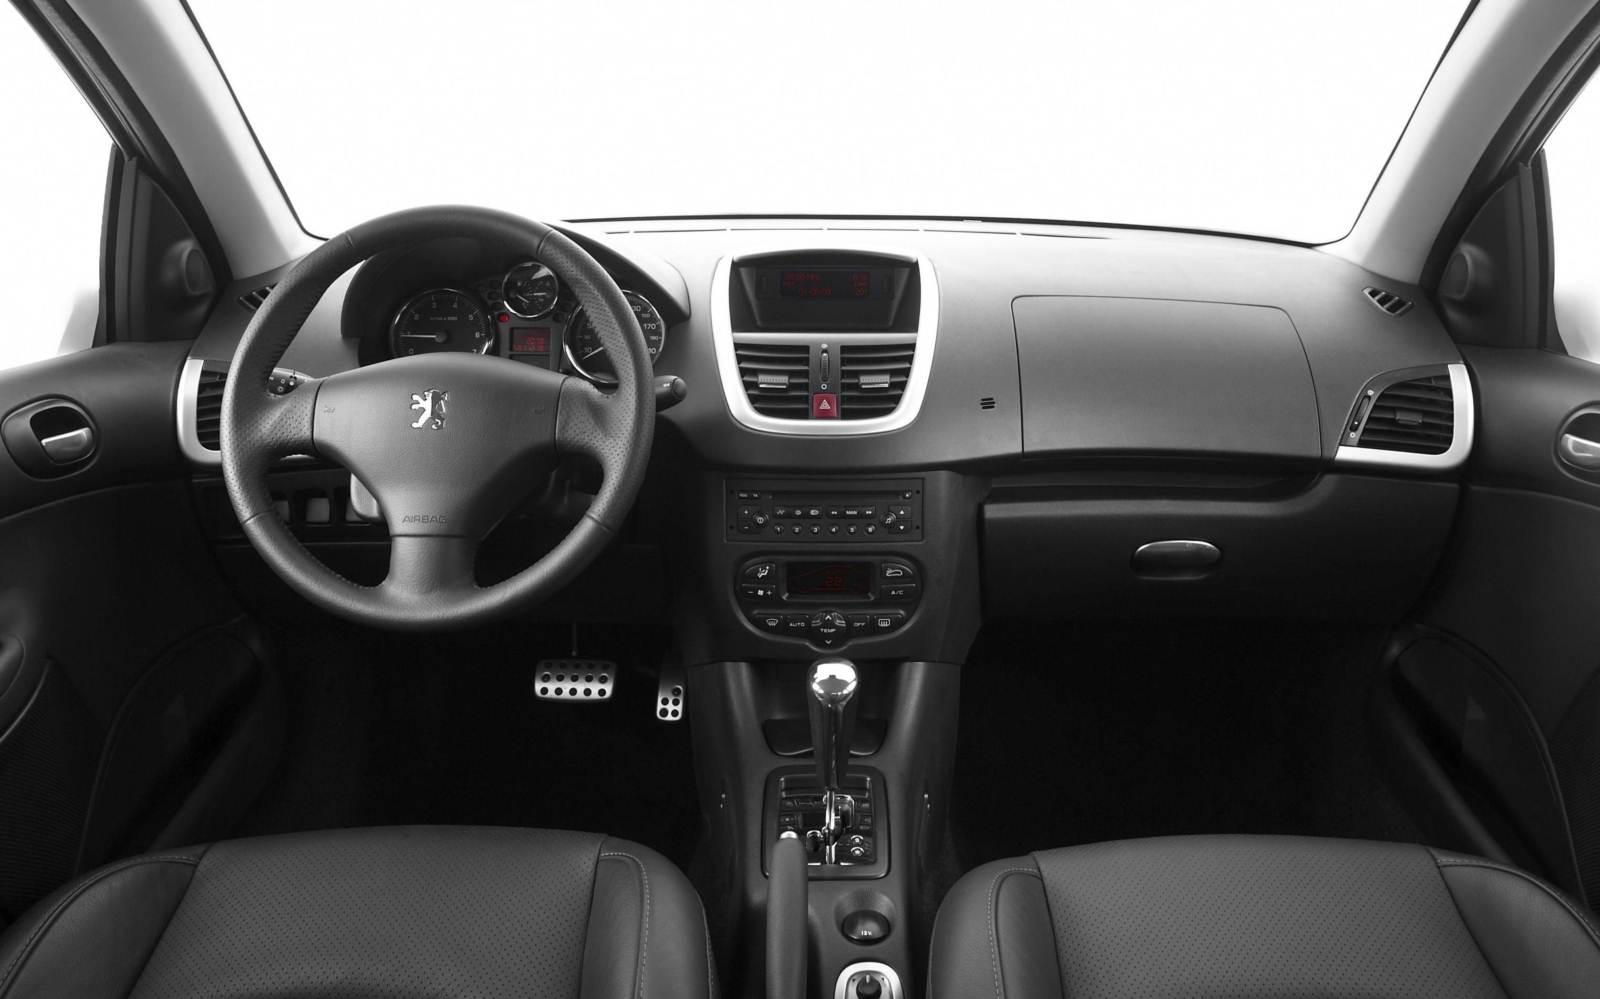 Peugeot 207 passion muda nome para 207 sedan car blog br for Peugeot 207 interior